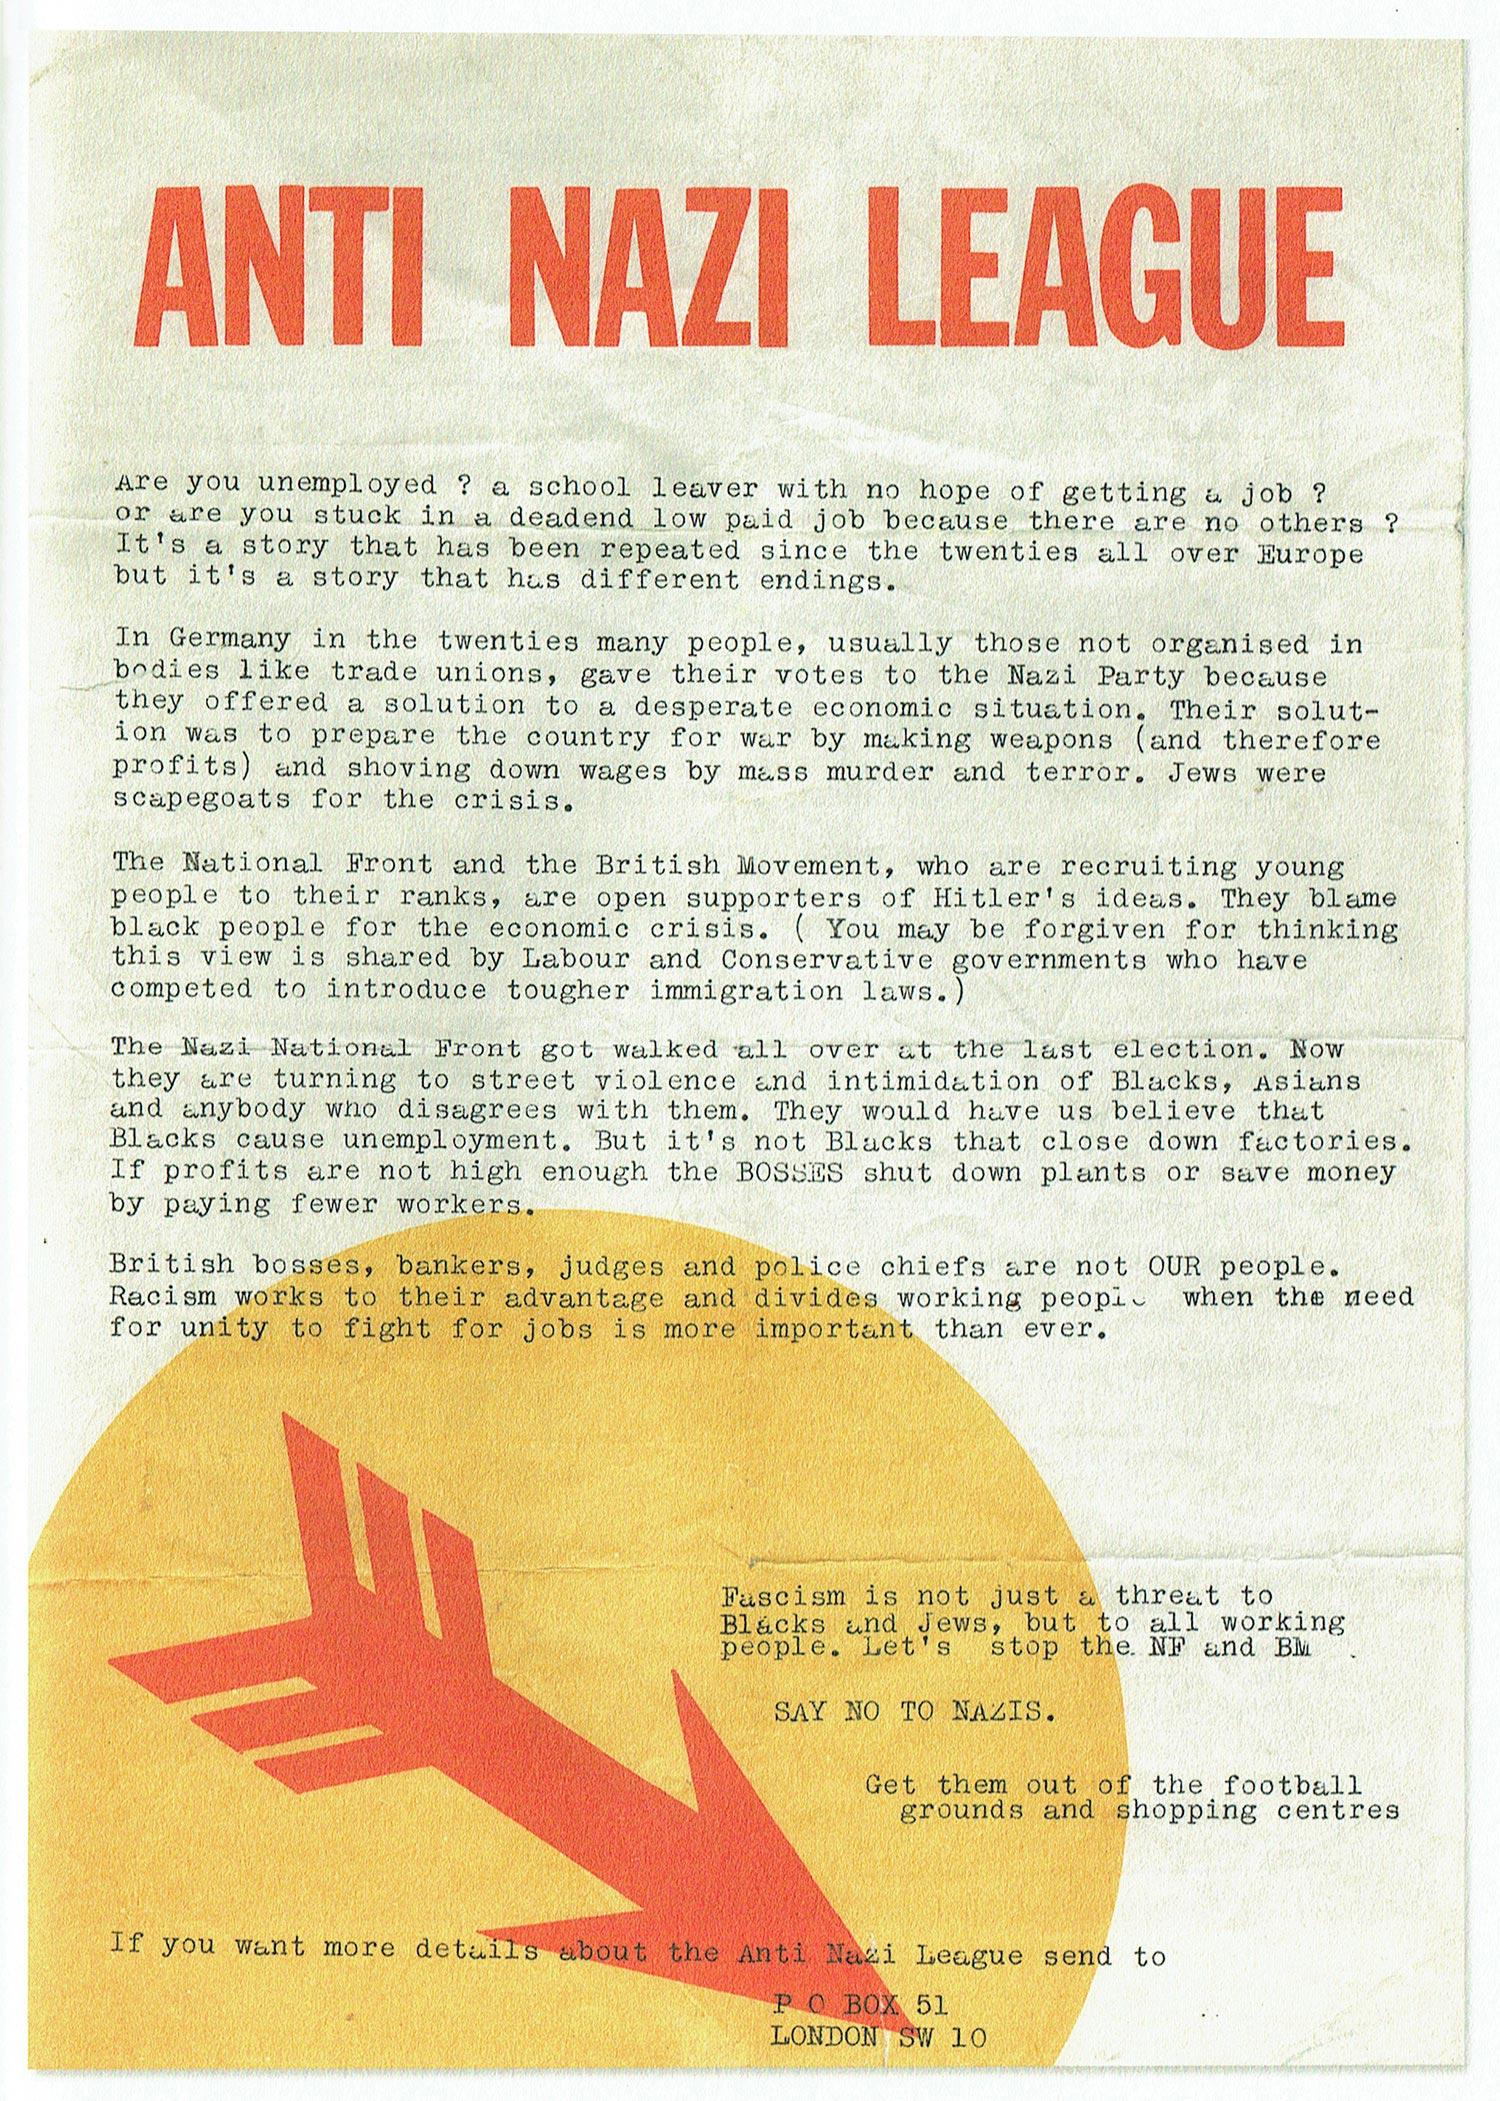 anti-nazi-league-1970s